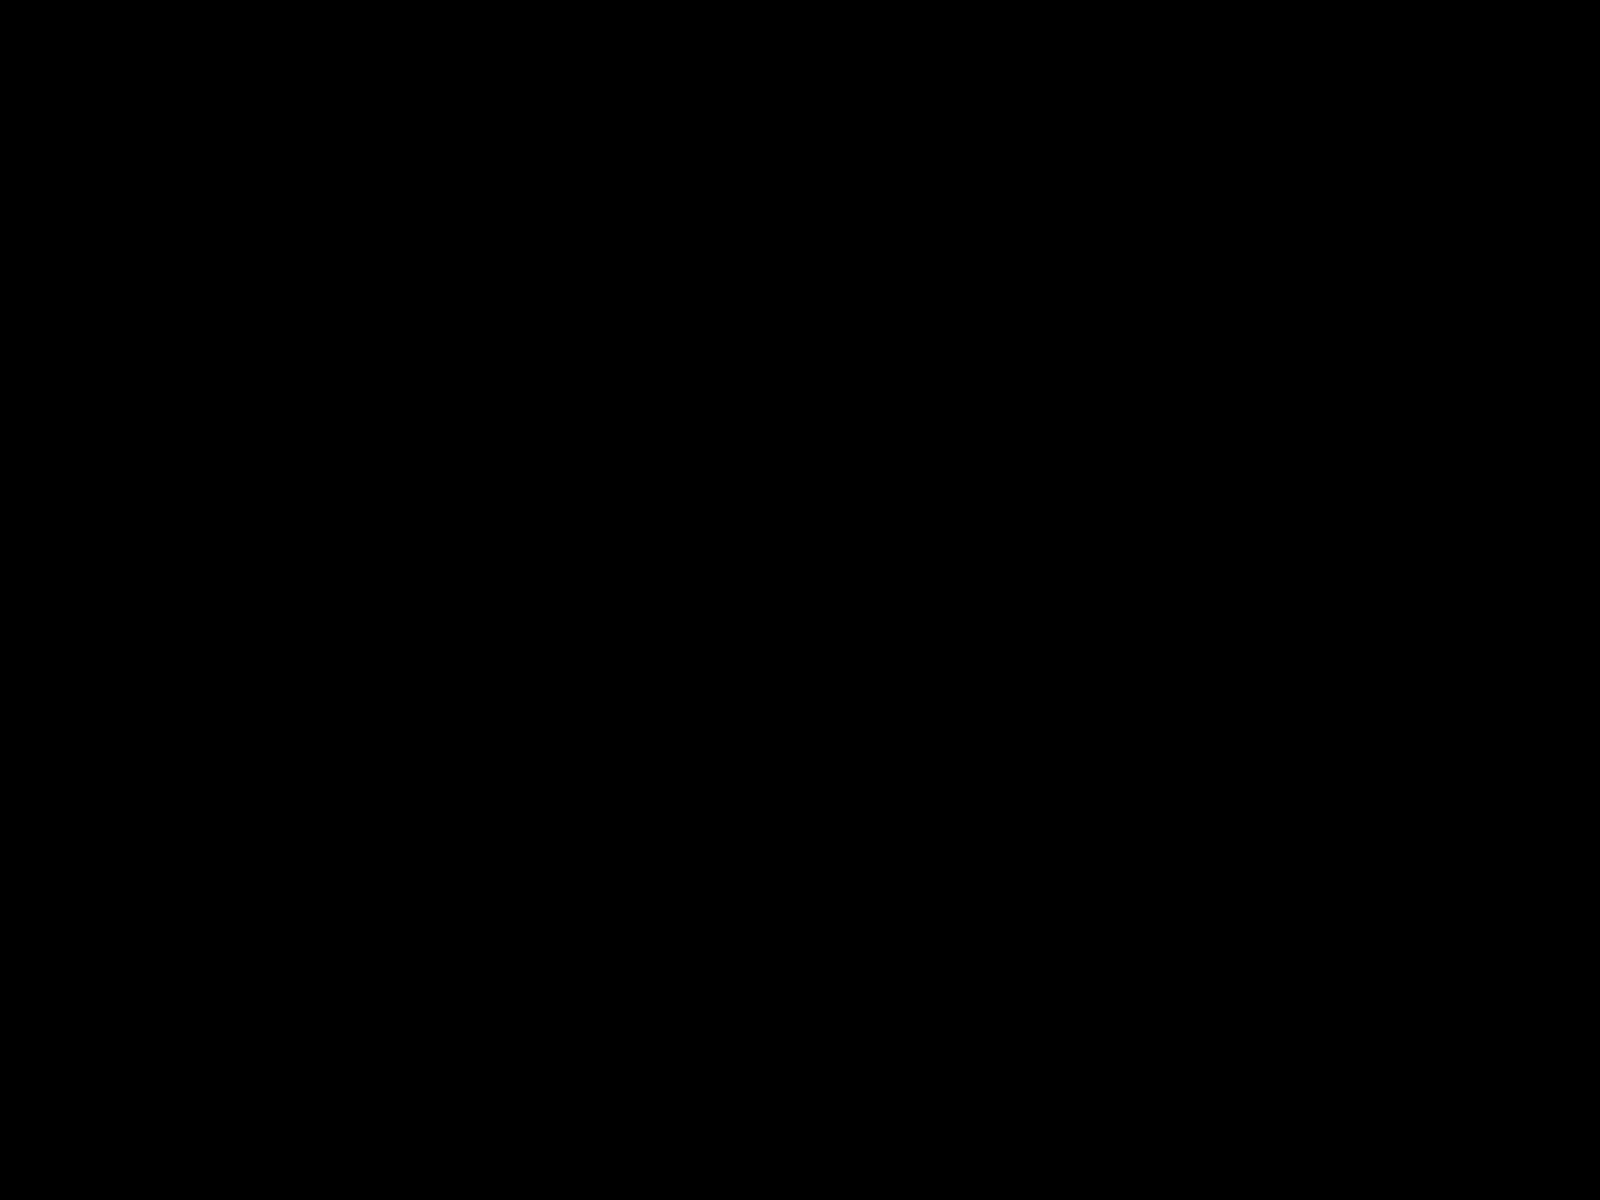 1600x1200 Black Solid Color Background